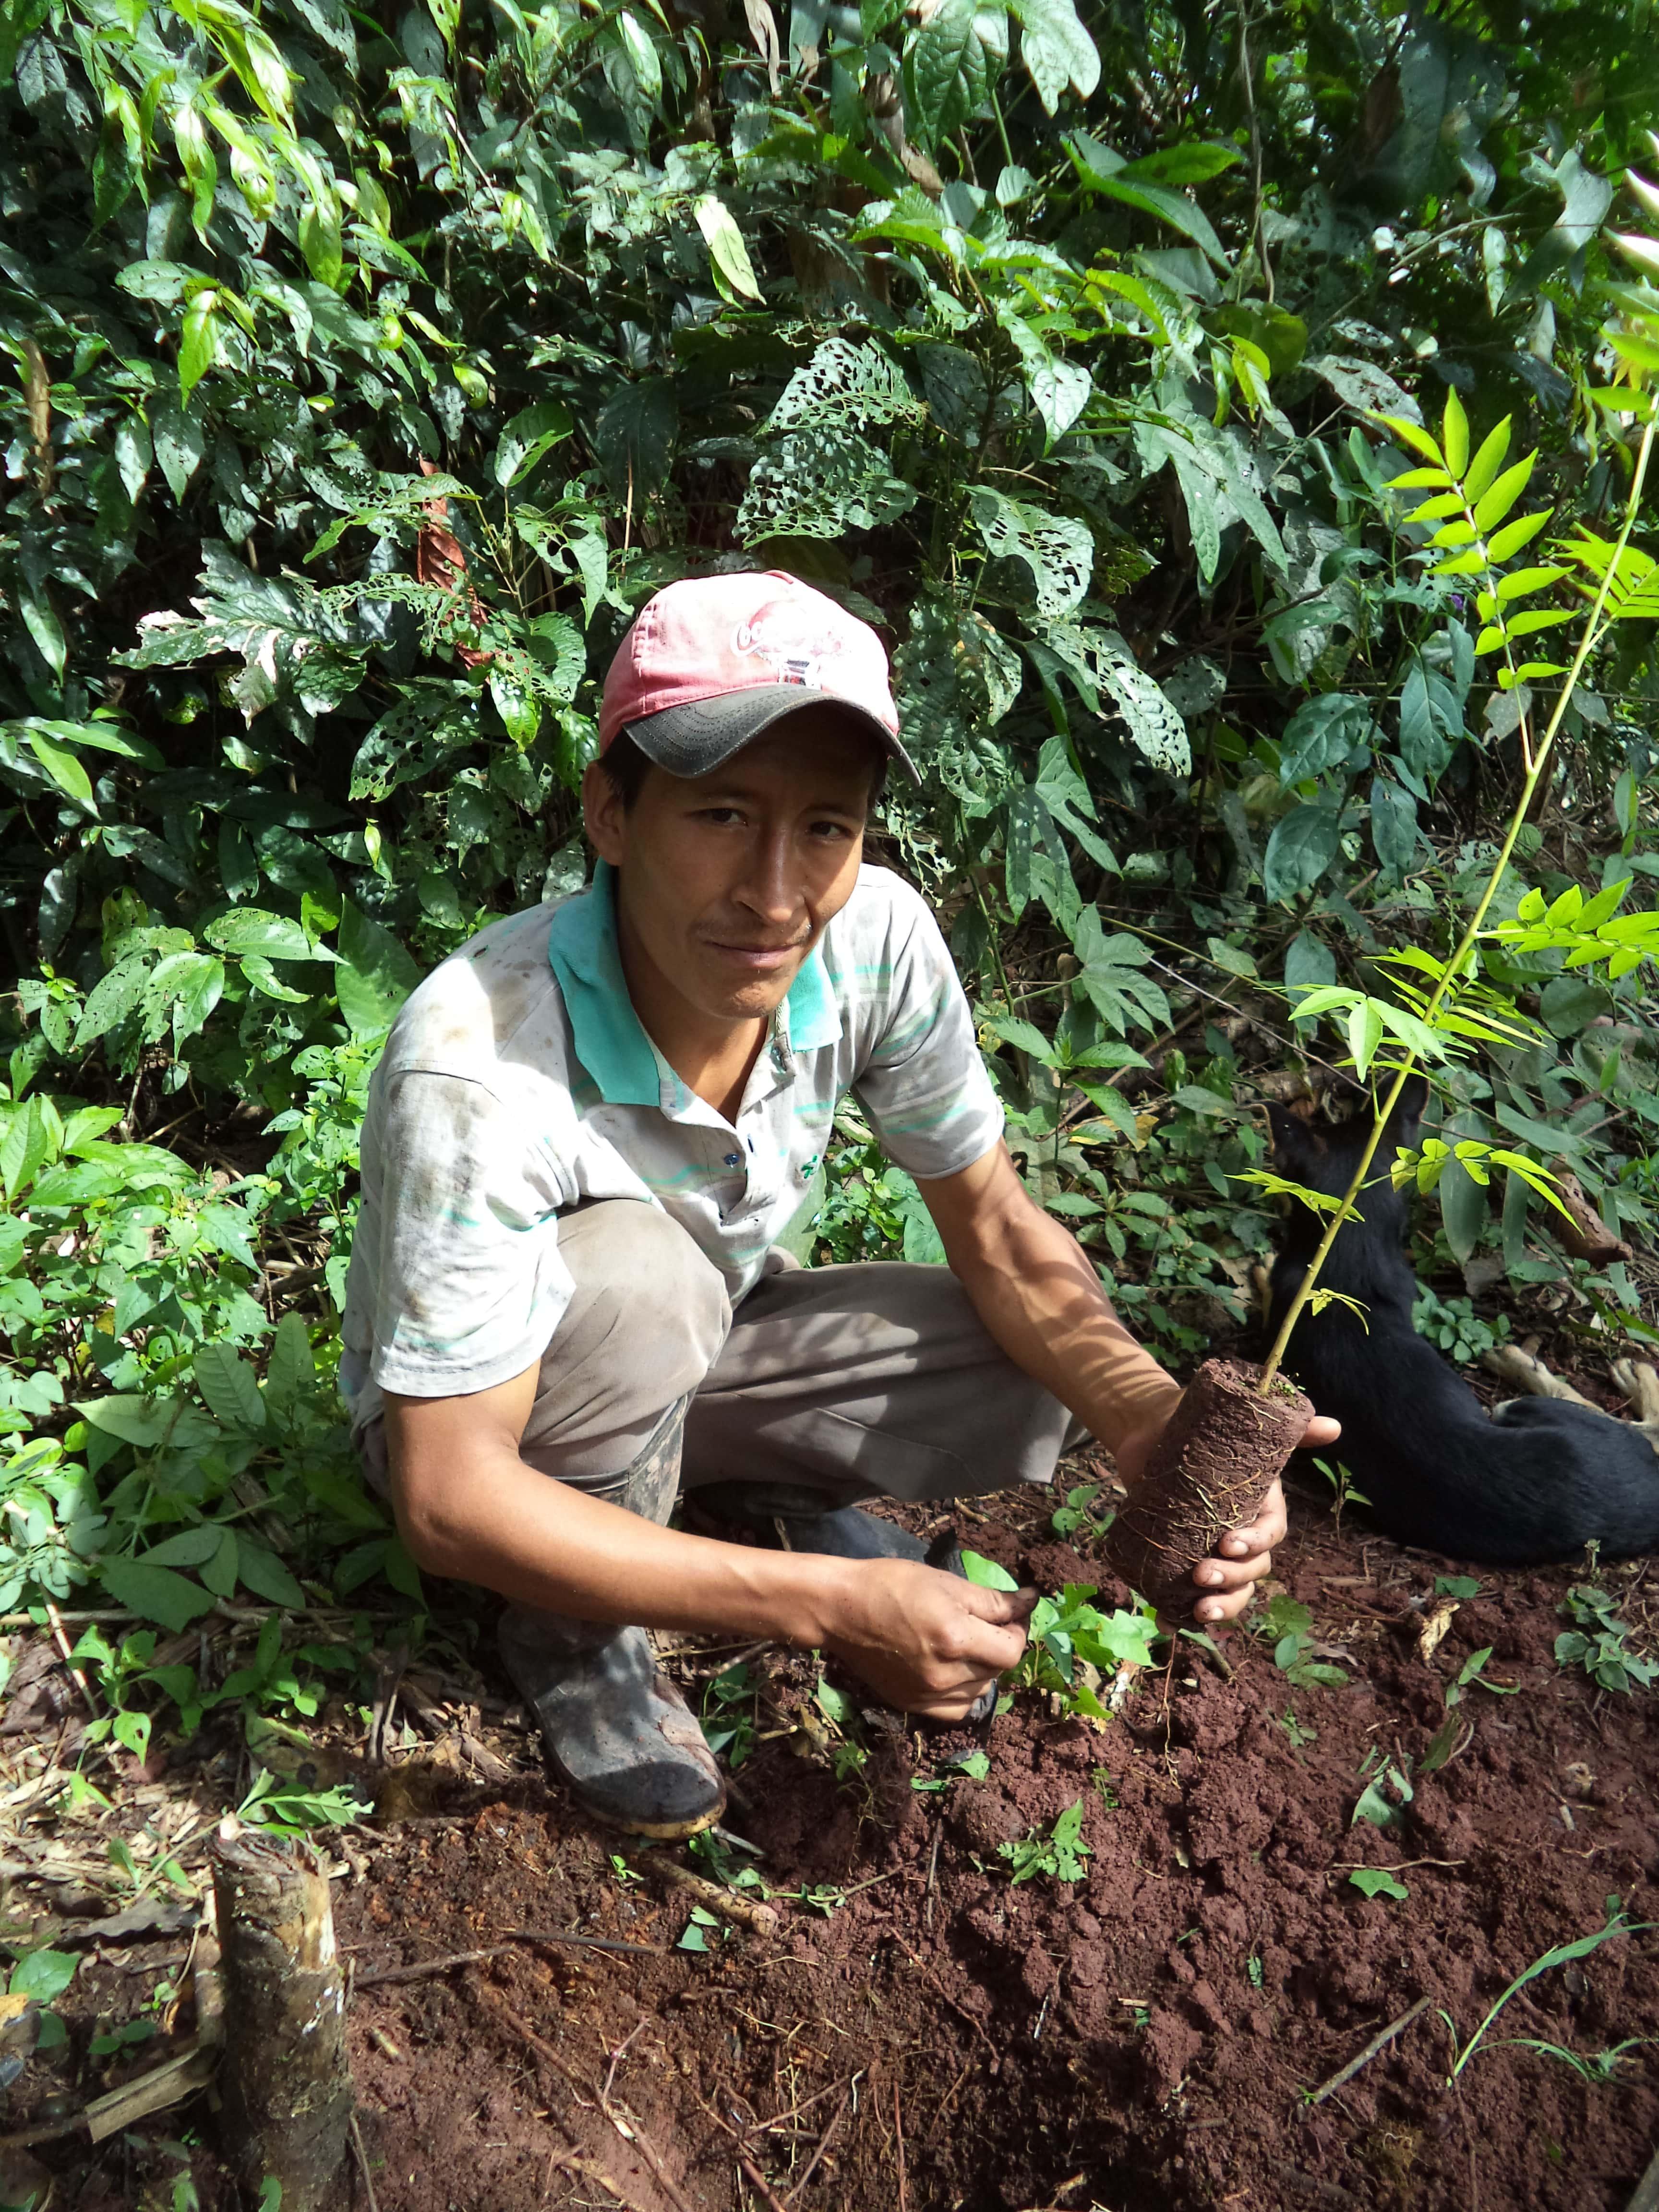 Pérou - Reforestacion Selva Central ©Frank Celi Montero 2017  (9).JPG